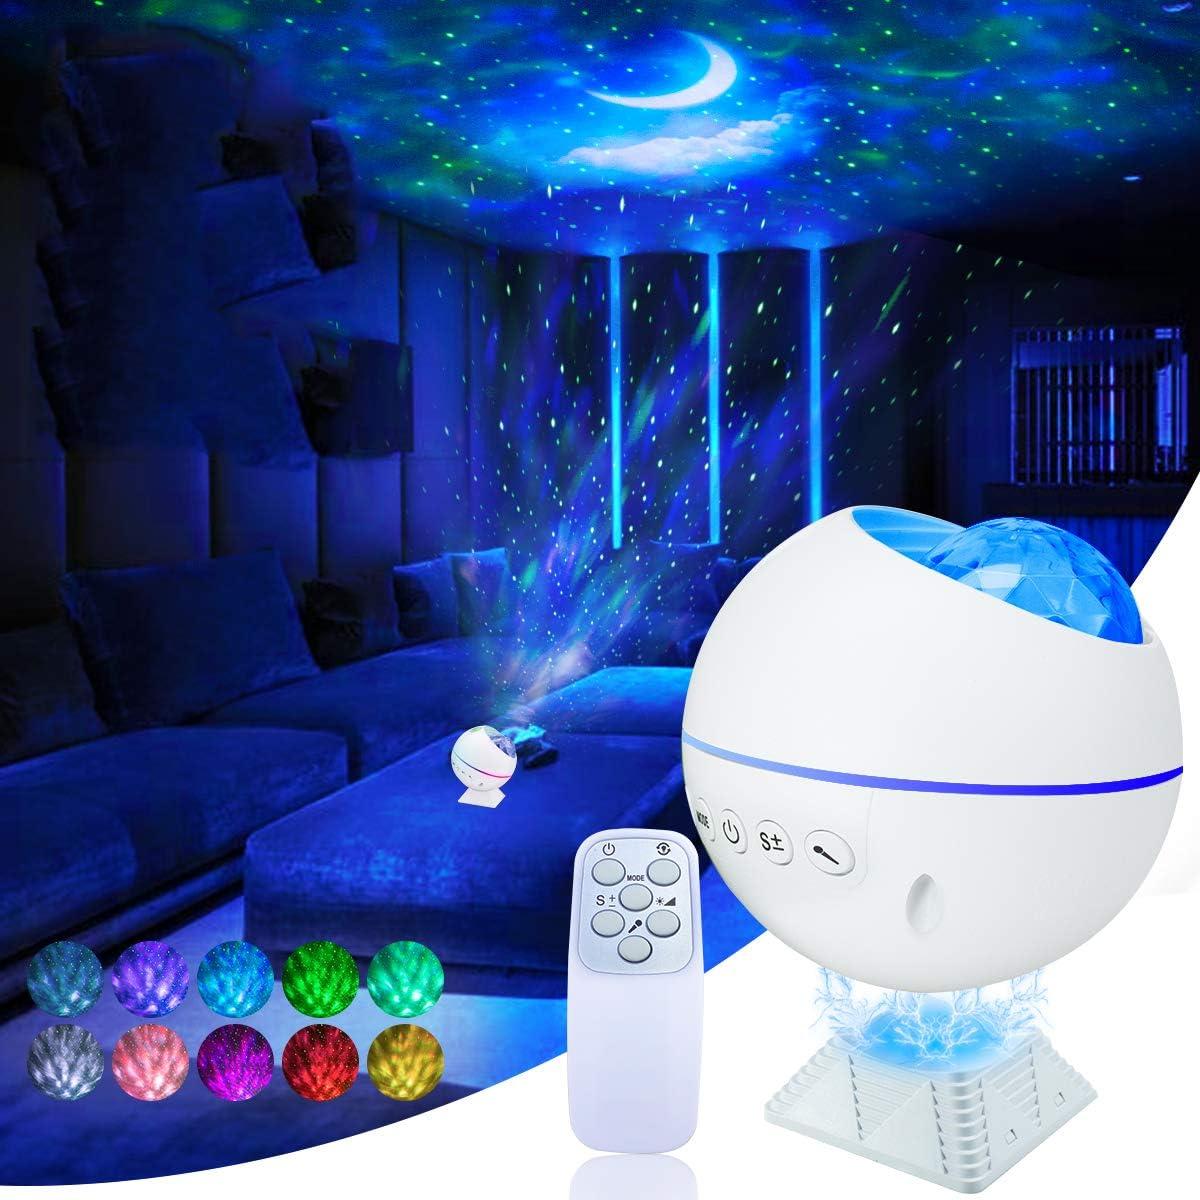 Galaxy Projector Night Light Sta Glow overseas Latest item